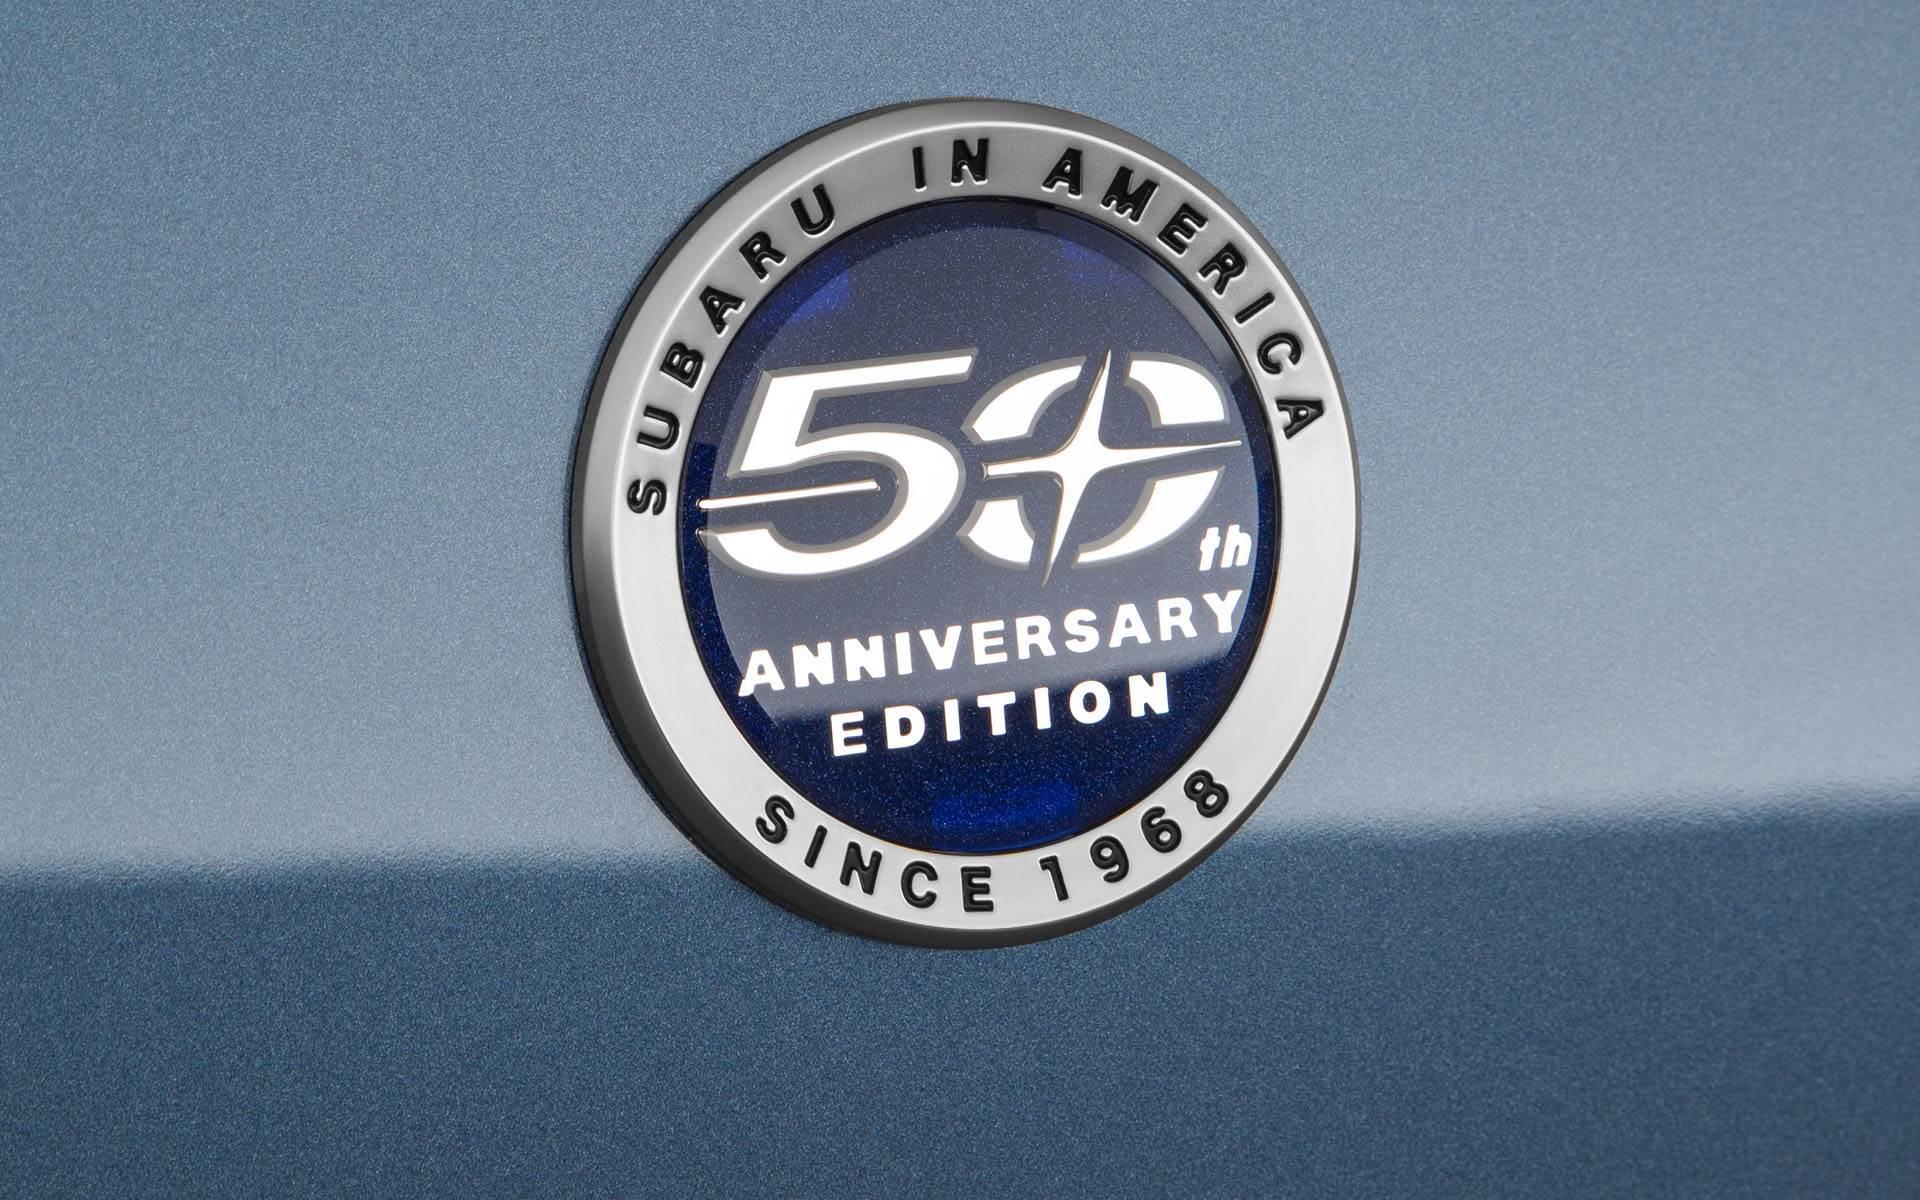 50thAnniversaryBadging.jpg